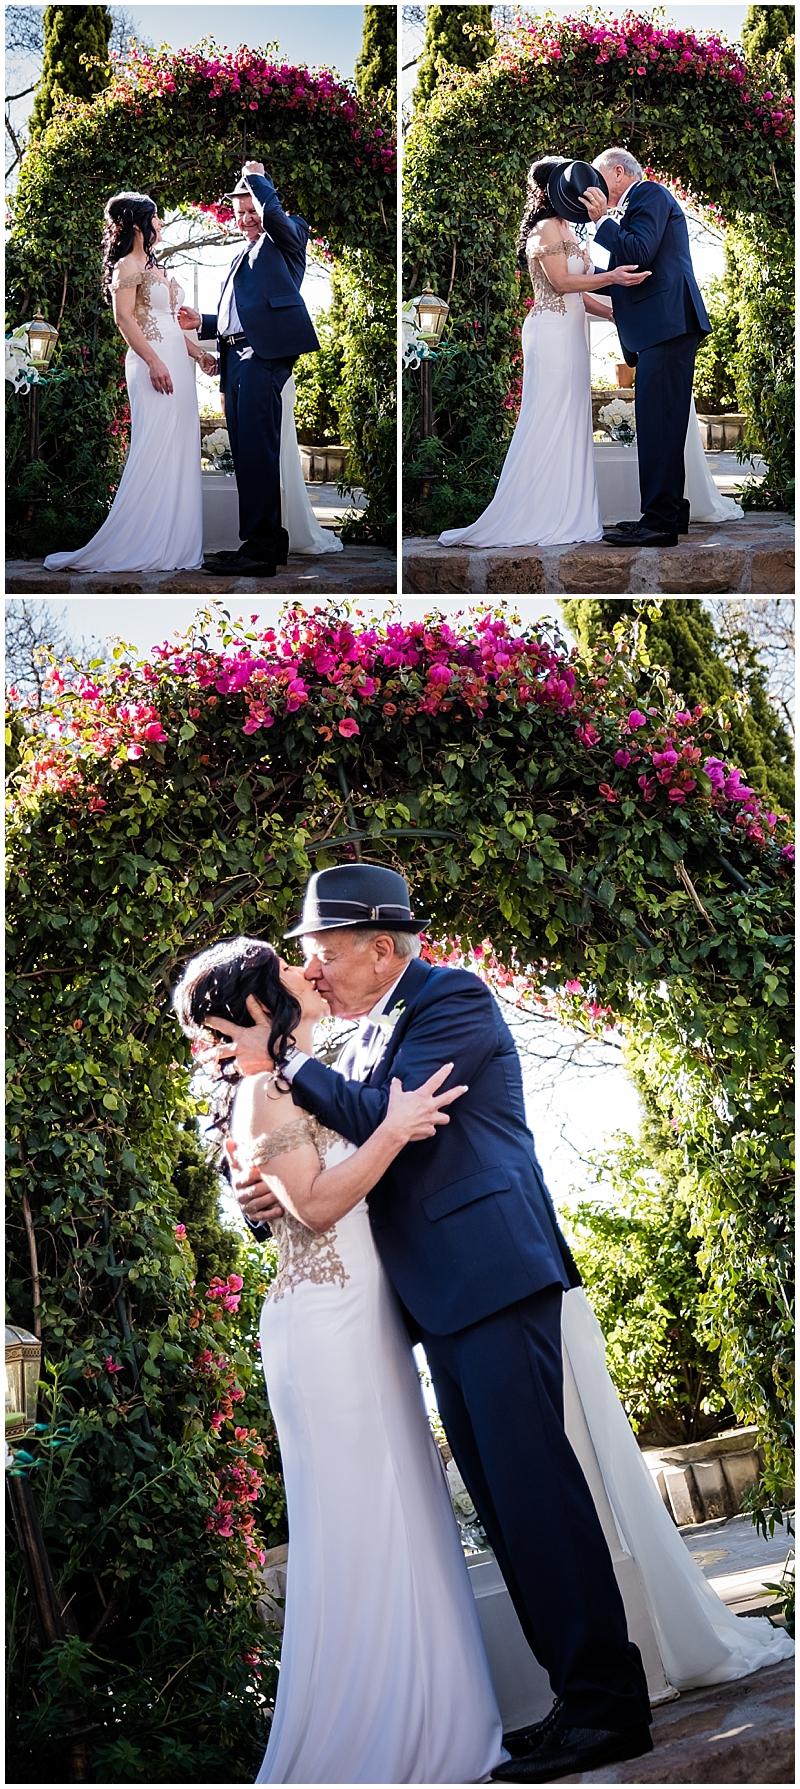 AlexanderSmith-173_AlexanderSmith Best Wedding Photographer-1.jpg